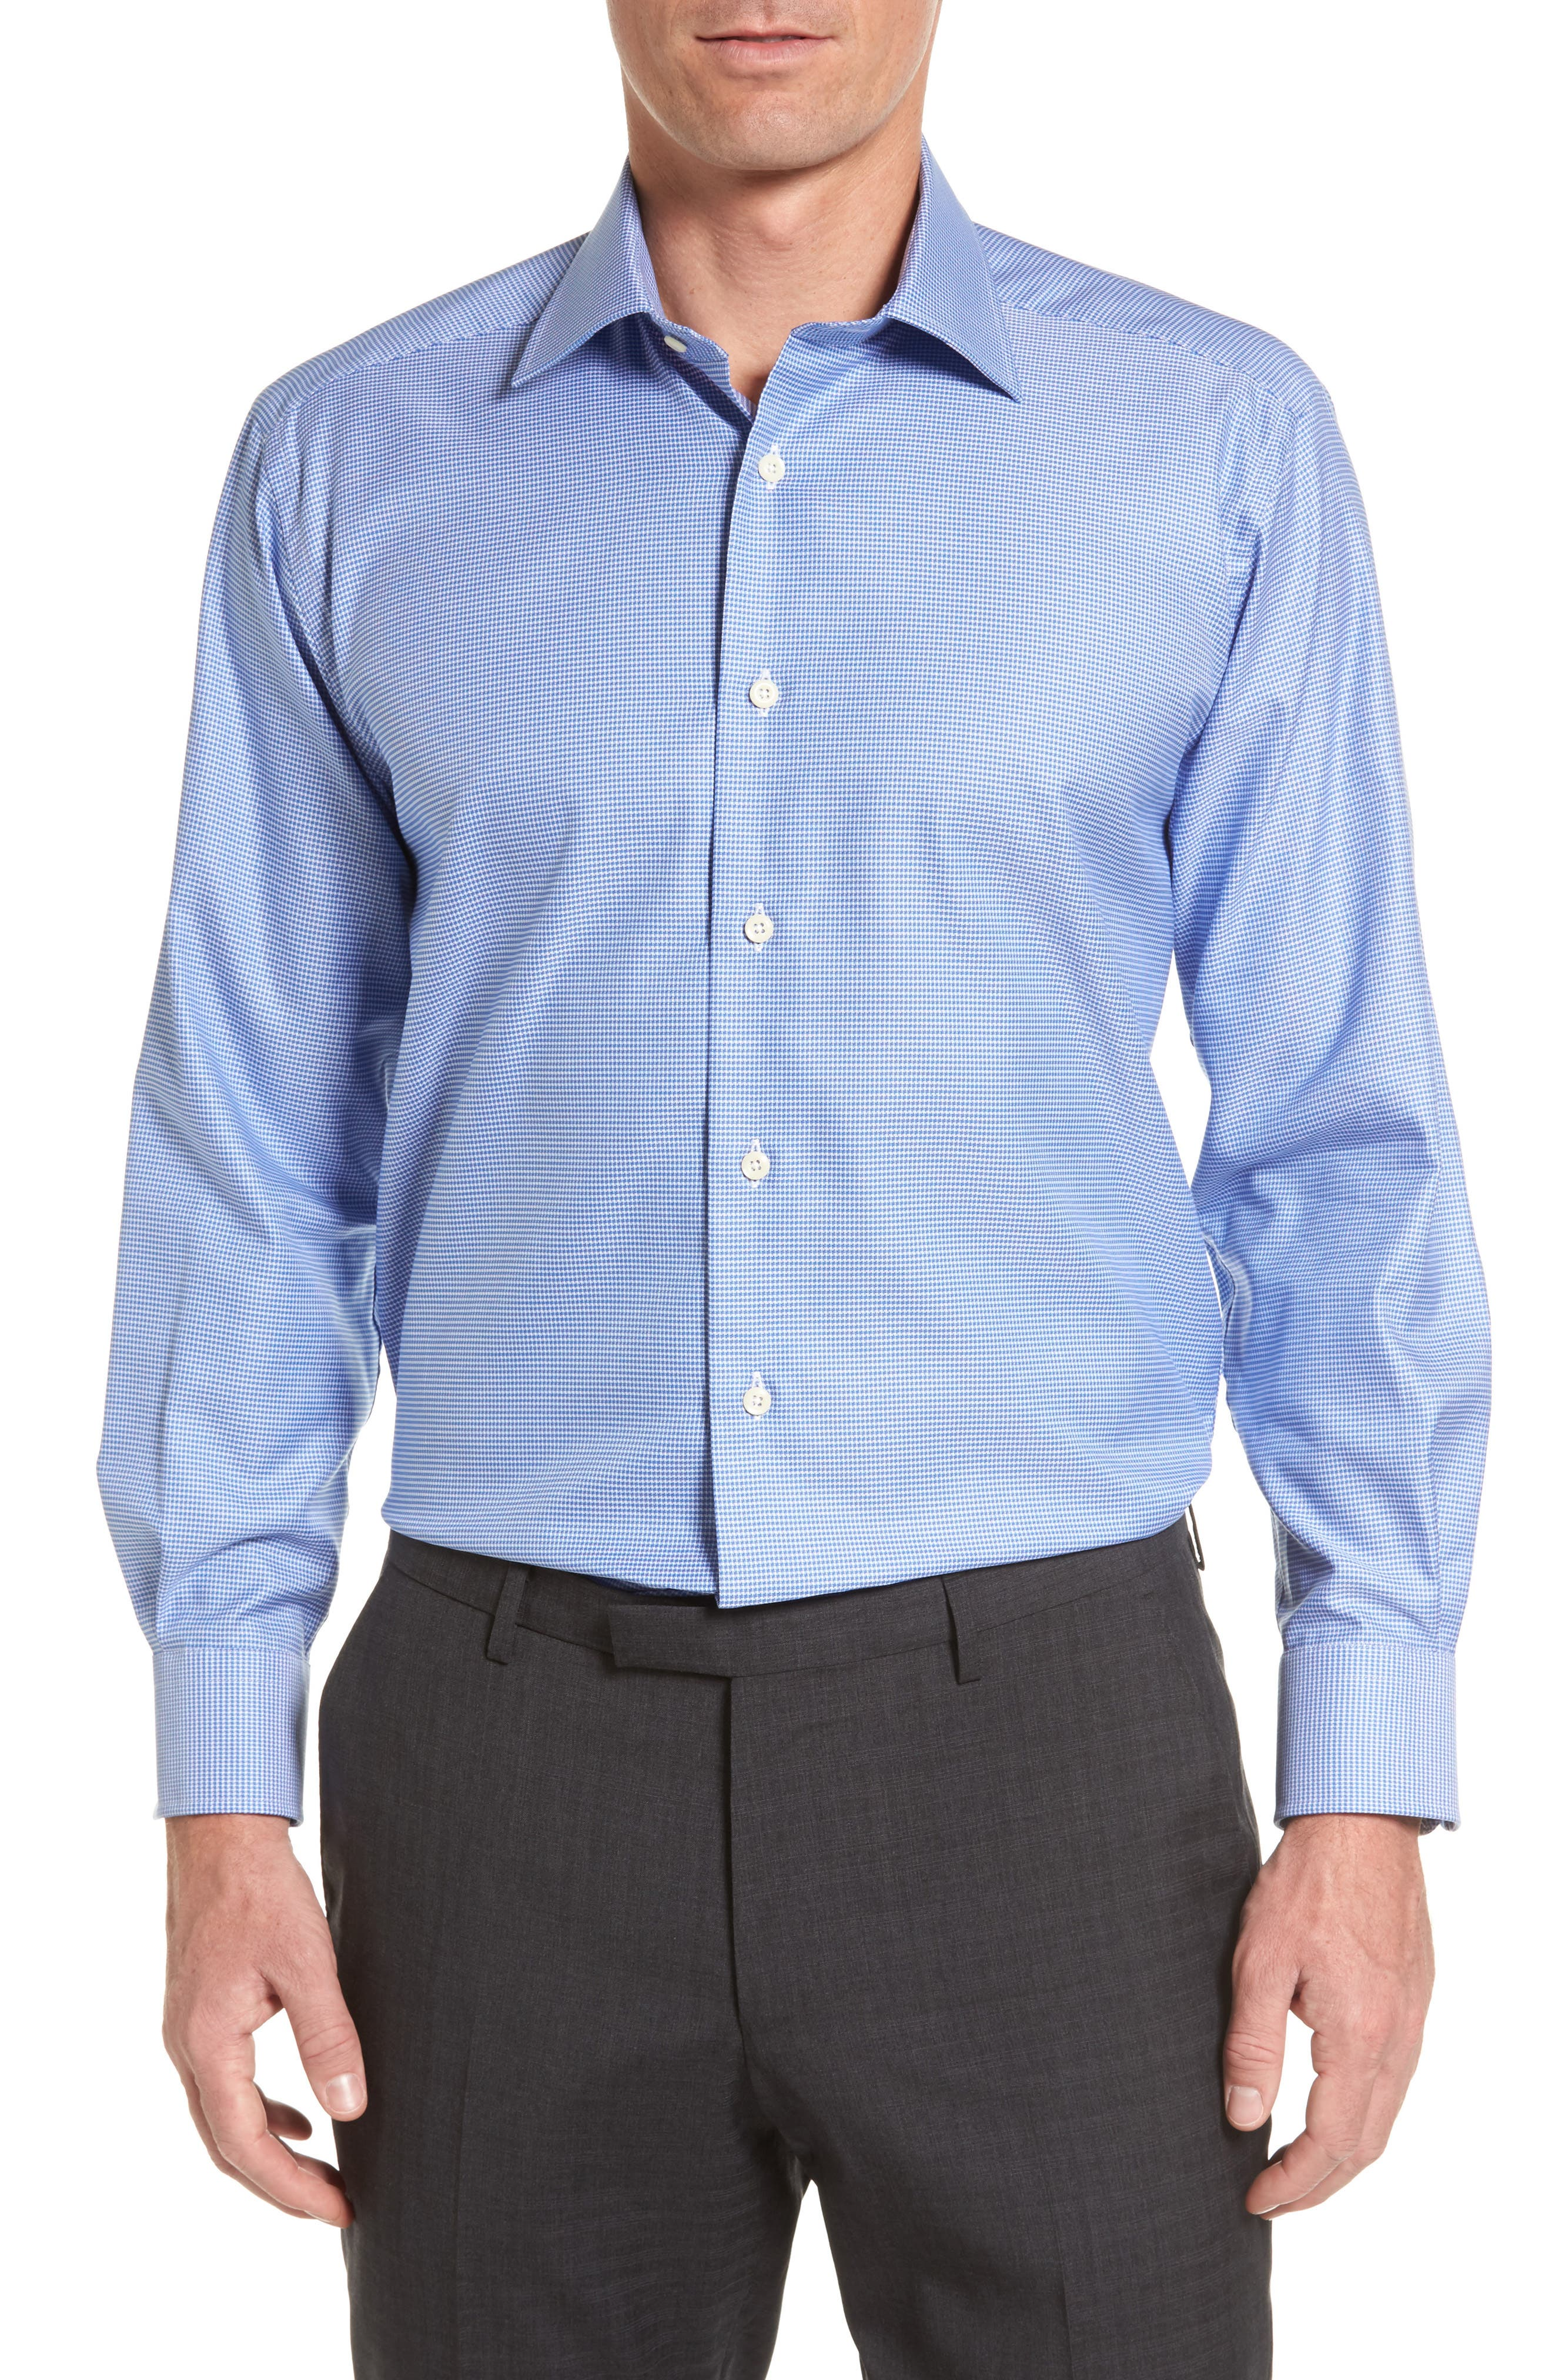 Regular Fit Houndstooth Dress Shirt,                             Main thumbnail 1, color,                             423